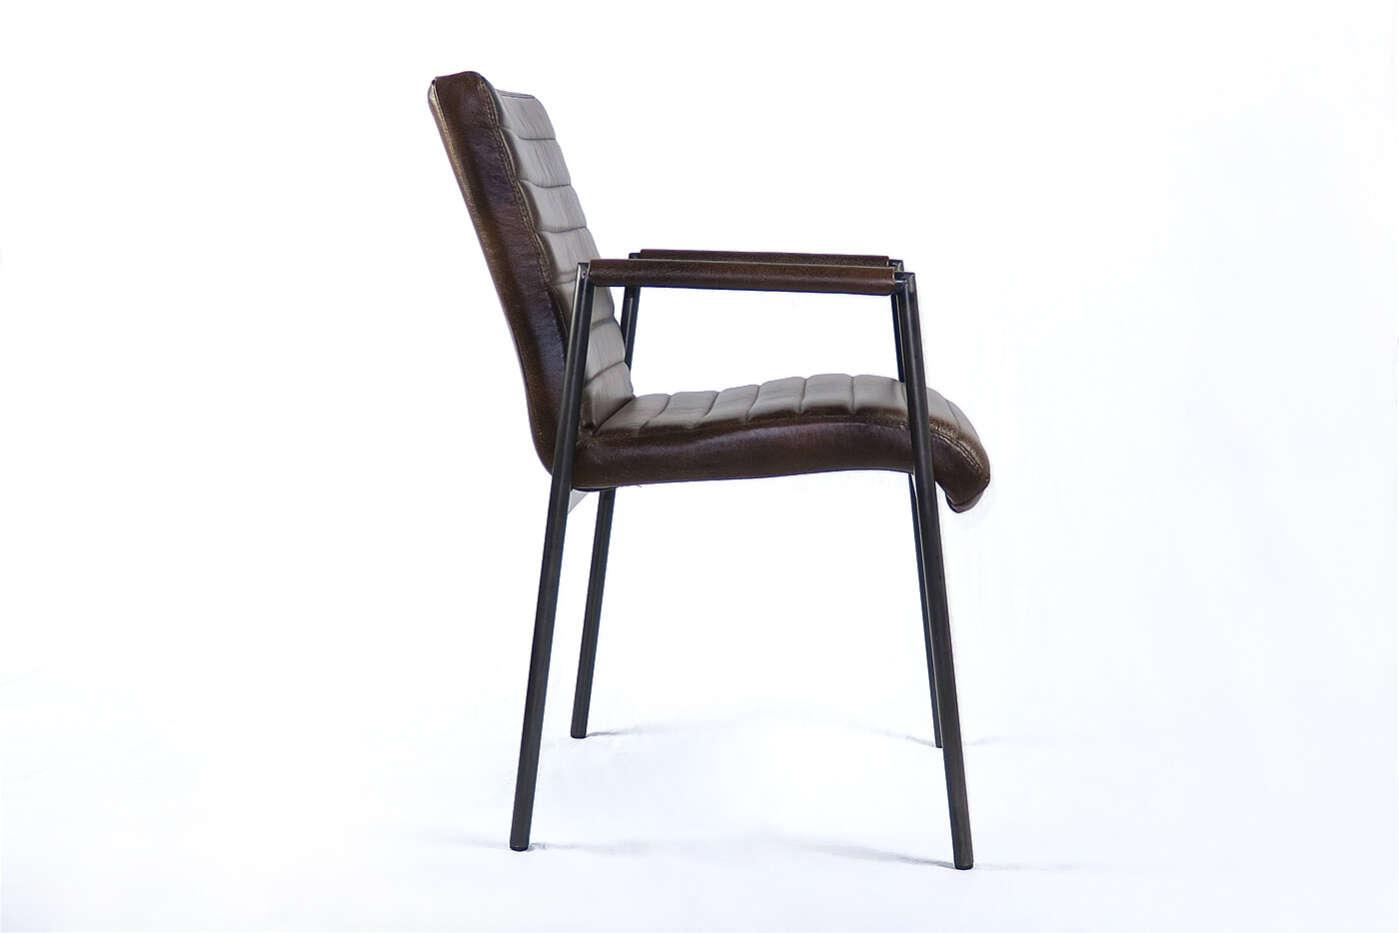 Echtleder stuhl esko im industriedesign for Stuhl industriedesign